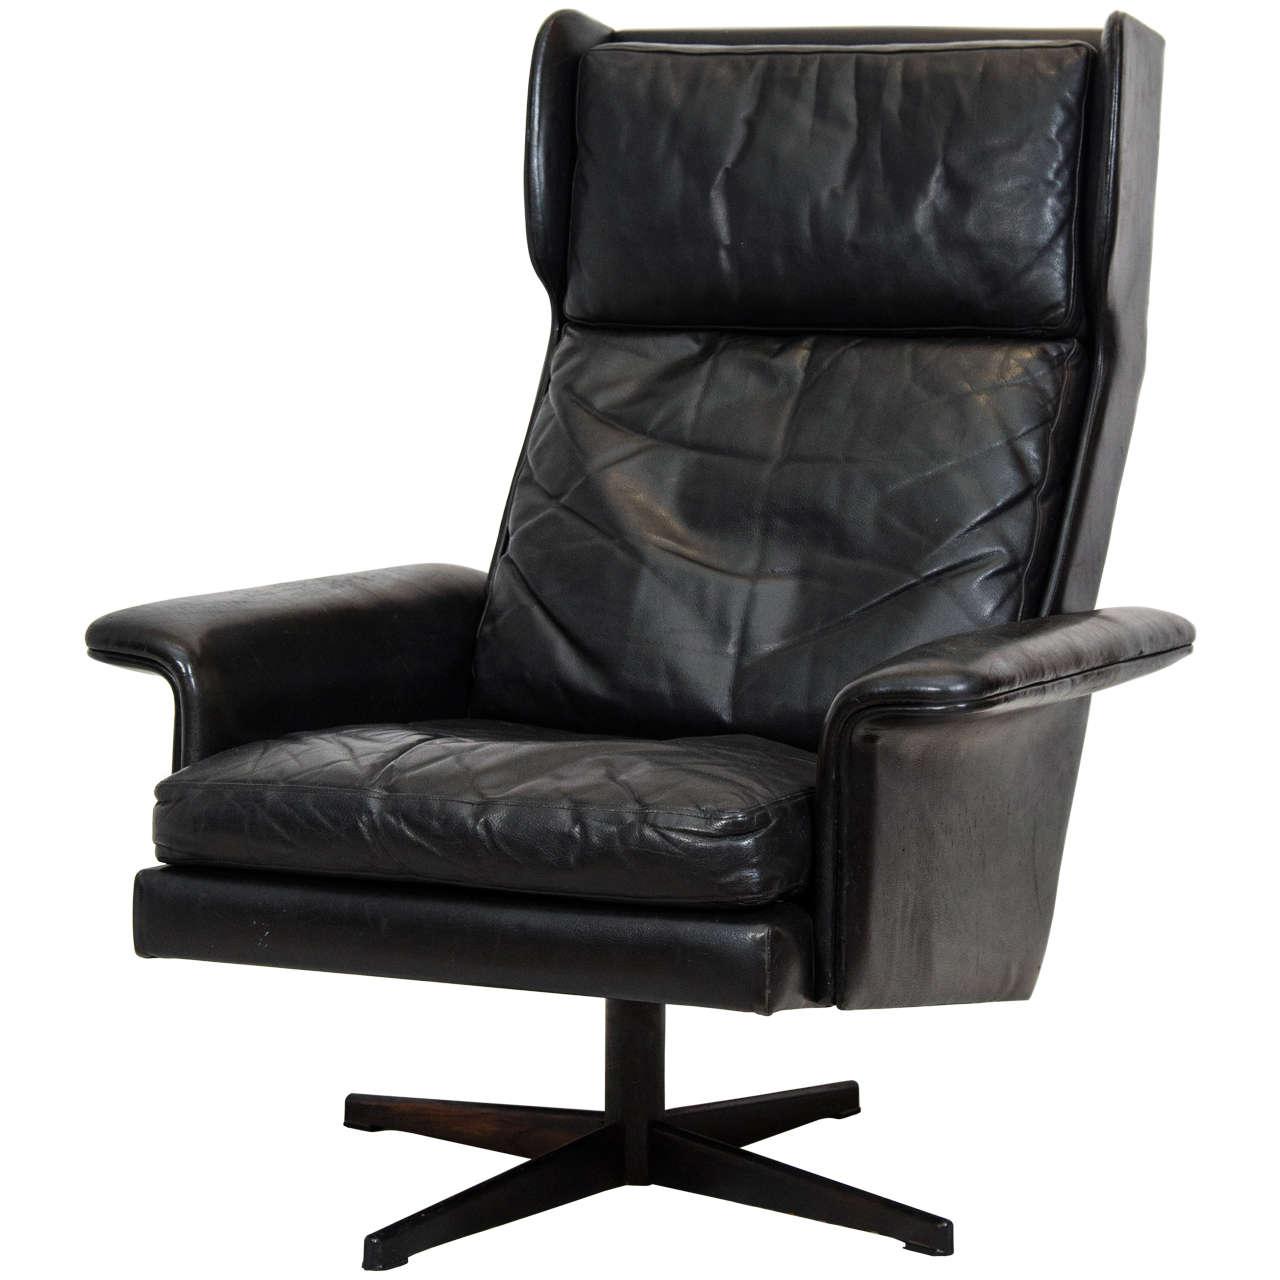 swivel chair nigeria cheap patio chairs danish lounge living